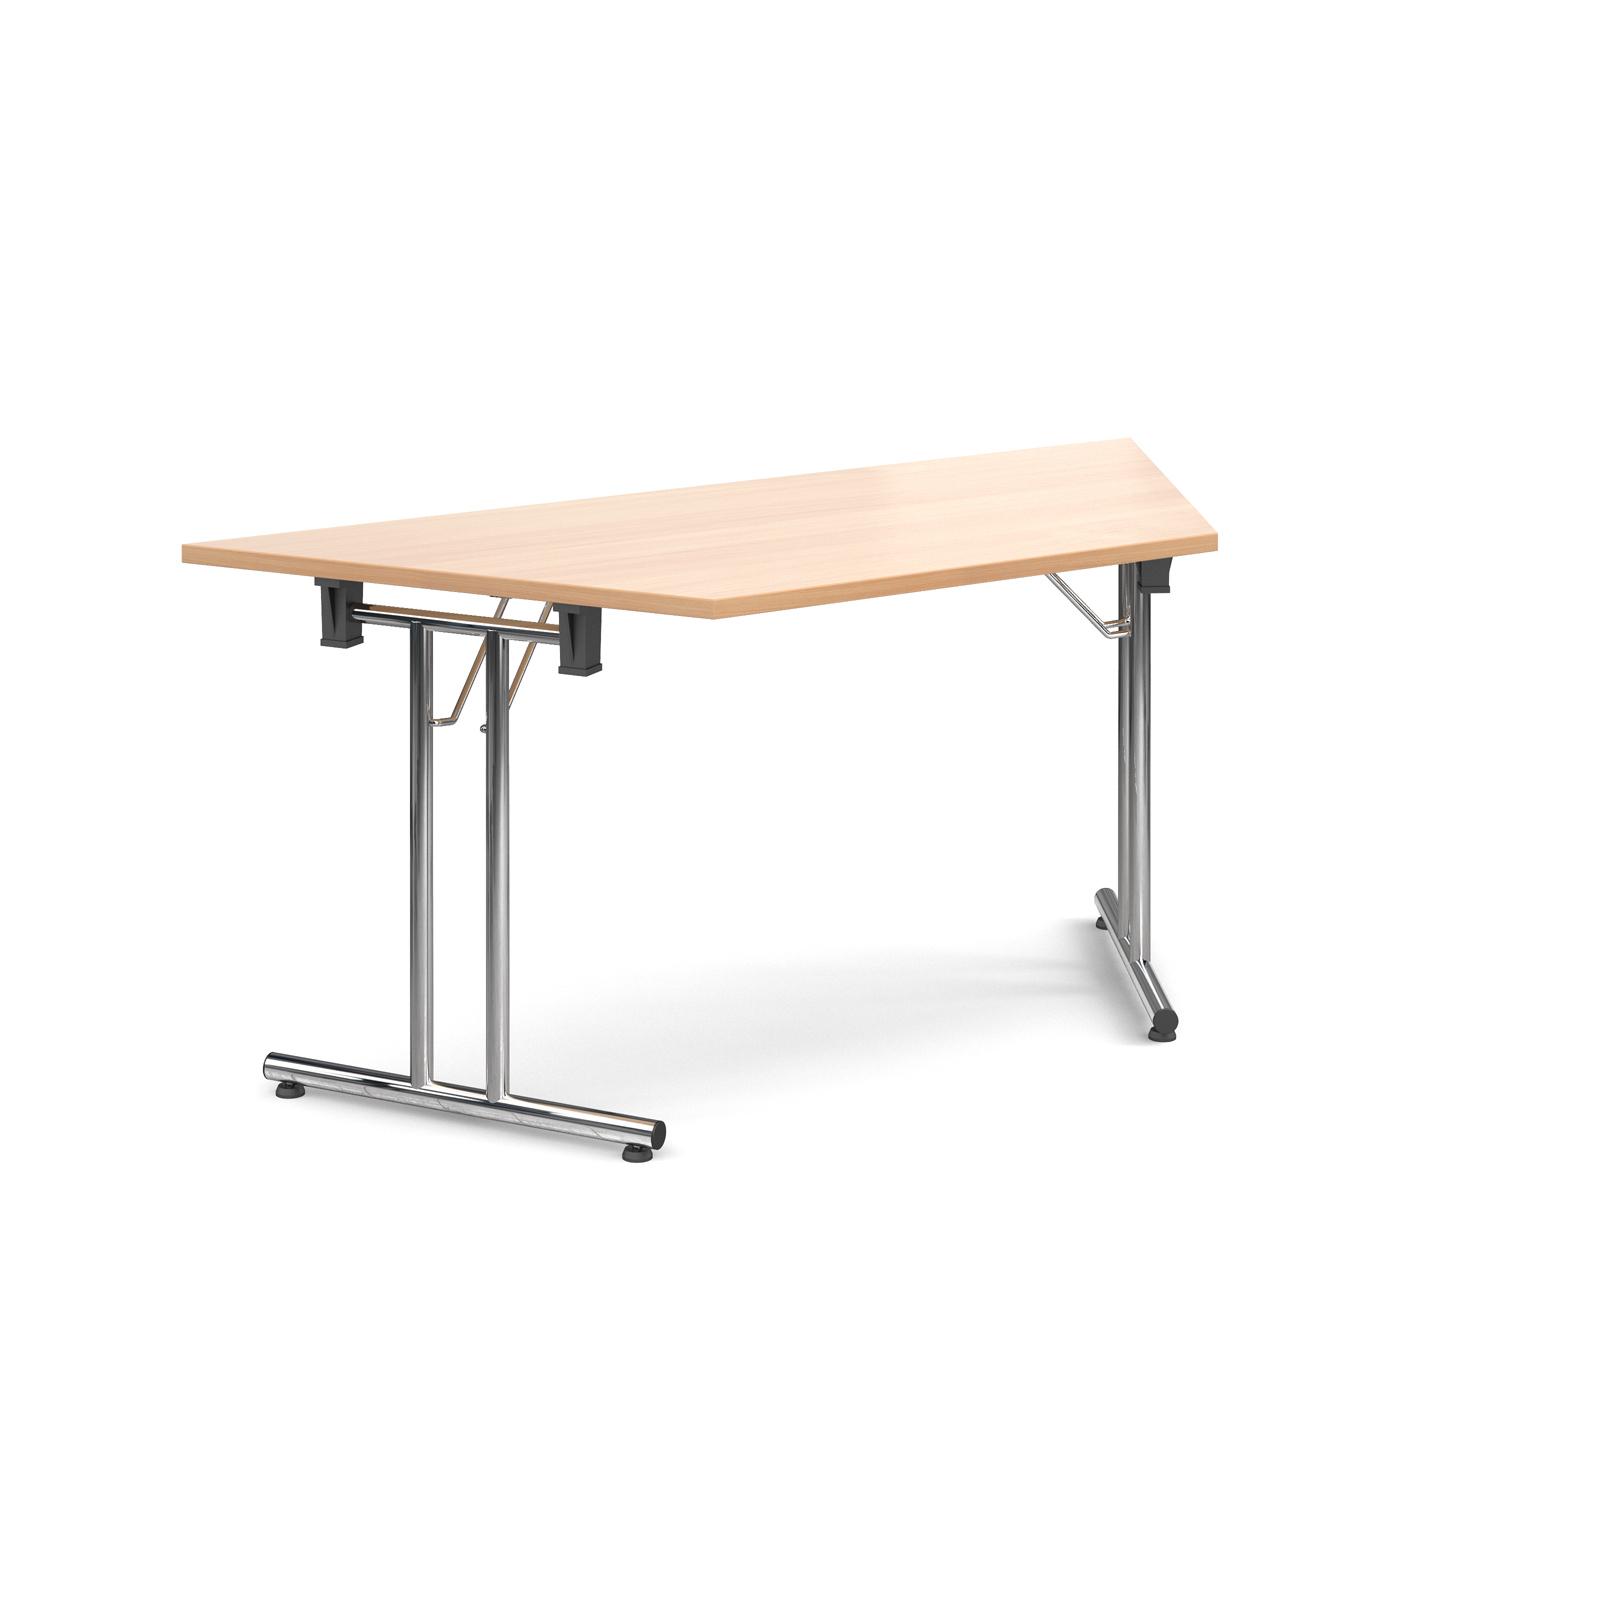 Low Fold Away Coffee Table: Dams Flexi Folding Table